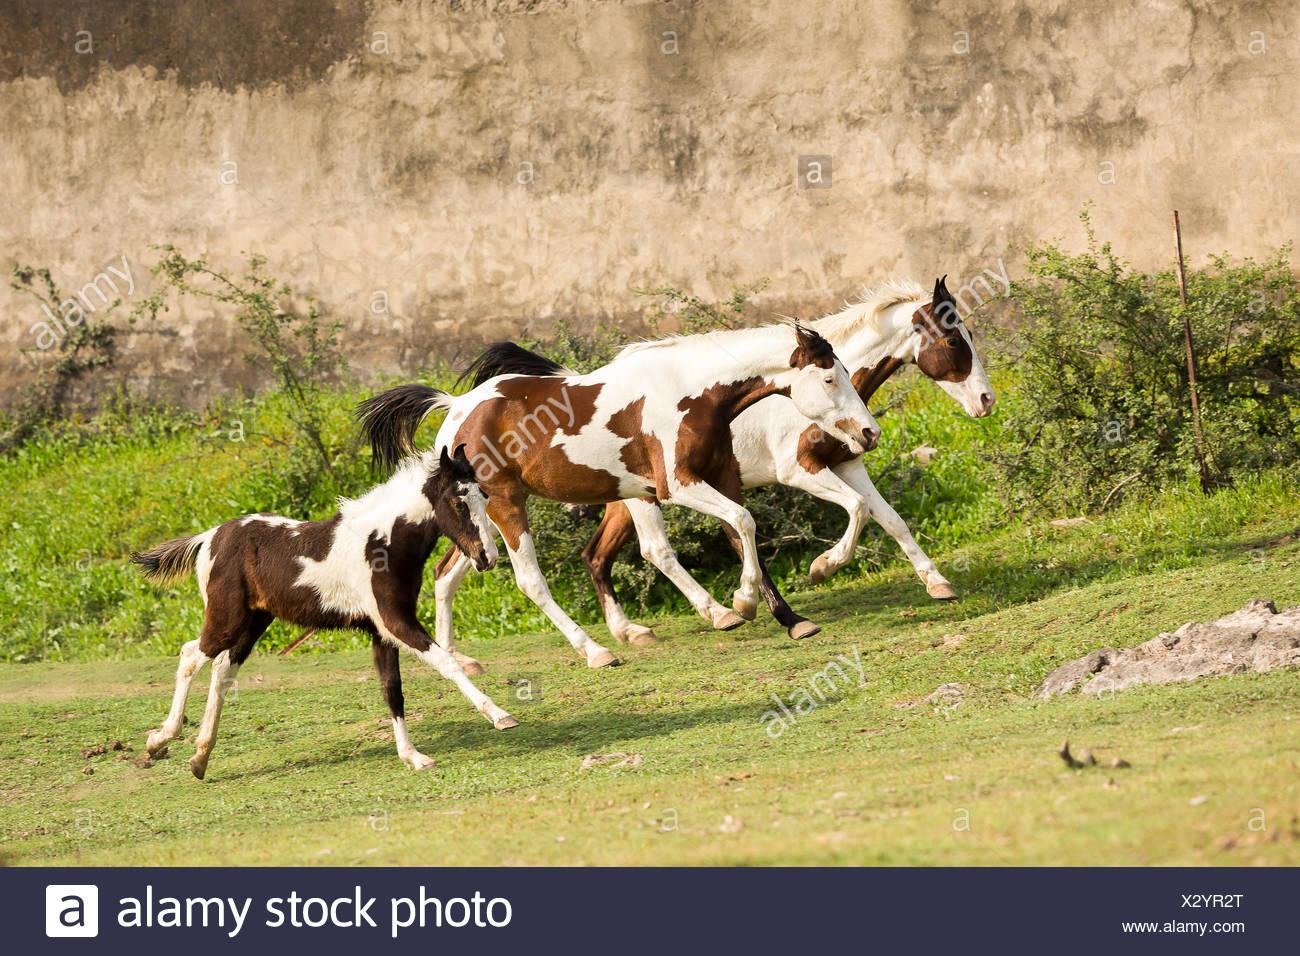 Marwari Horse. Trio of skewbald horses galloping on grass. Rajasthan, India - Stock Image